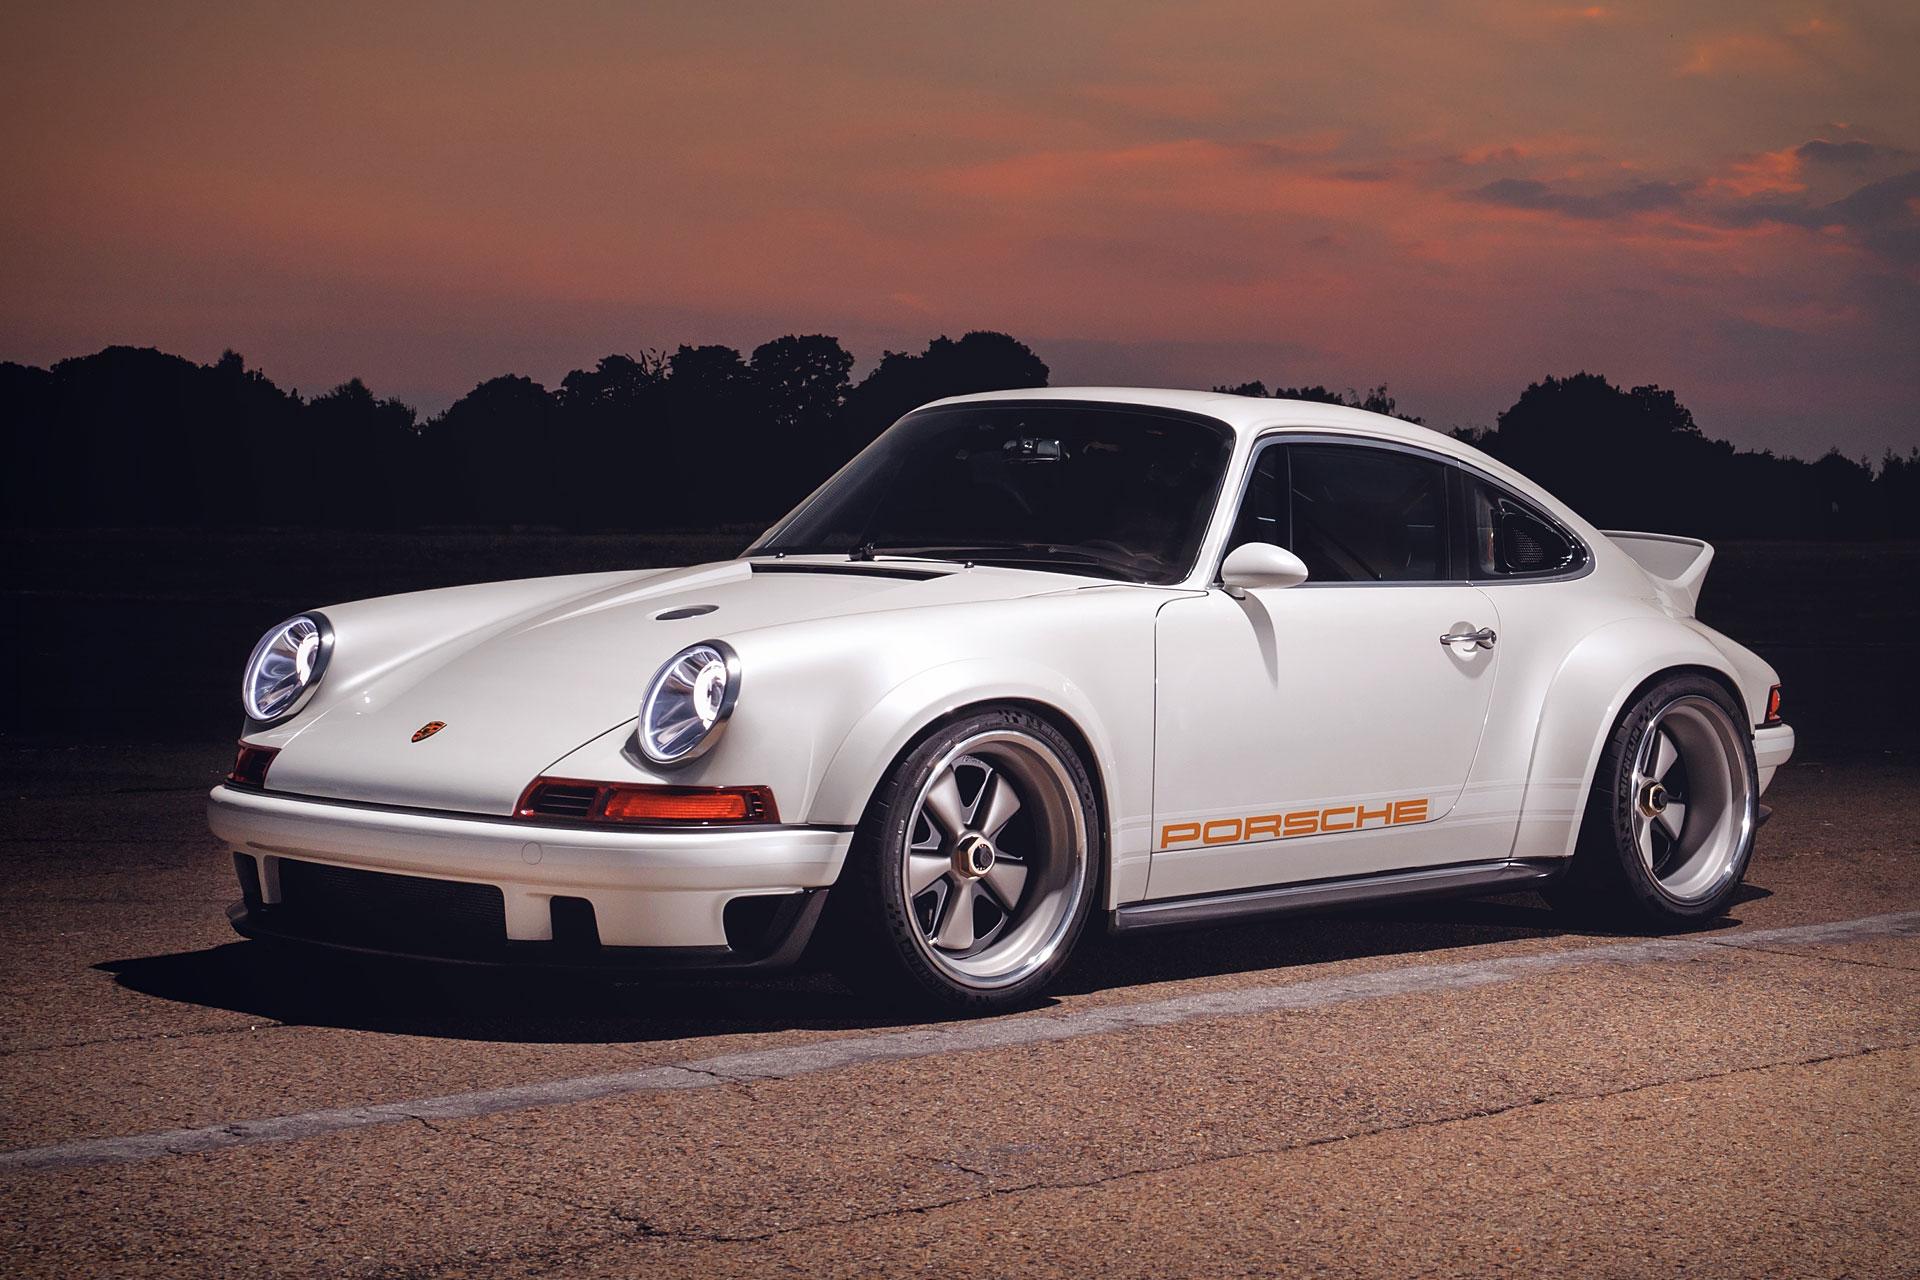 Singer Vehicle Design x Williams DLS Porsche Coupe